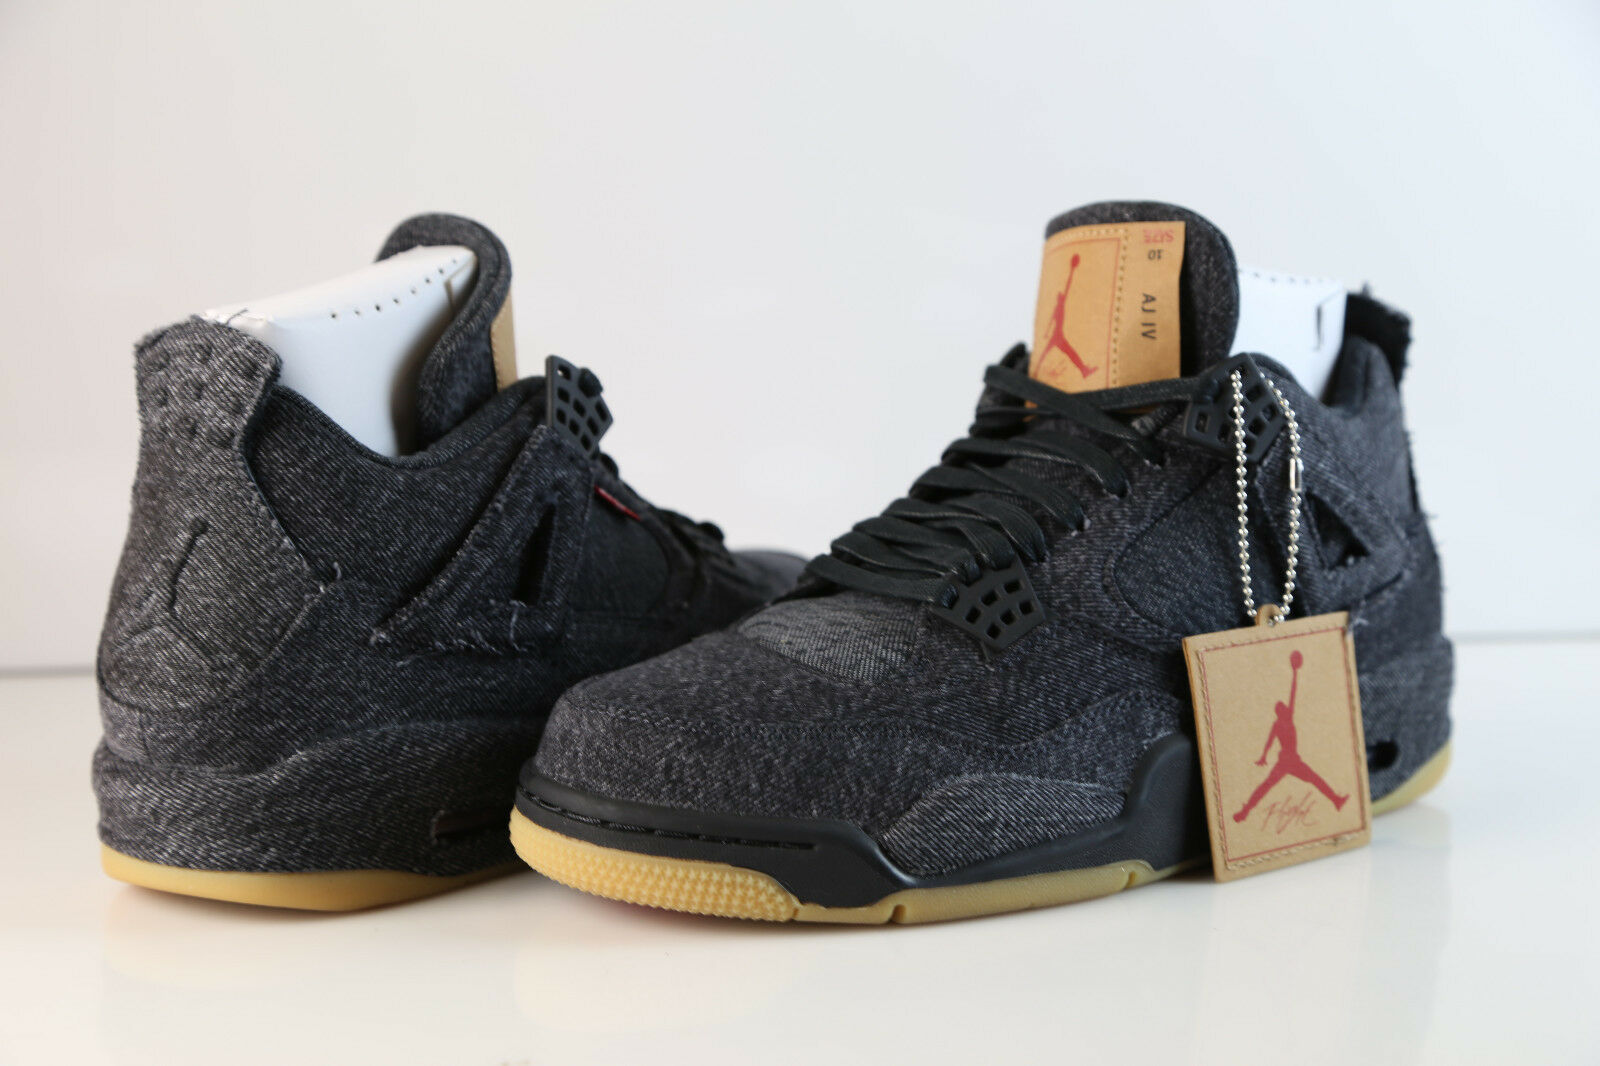 Nike air jordan x levi 's retro - 4 4 - schwarz denim ao2571-001 2018 20 kaugummi 489ccc